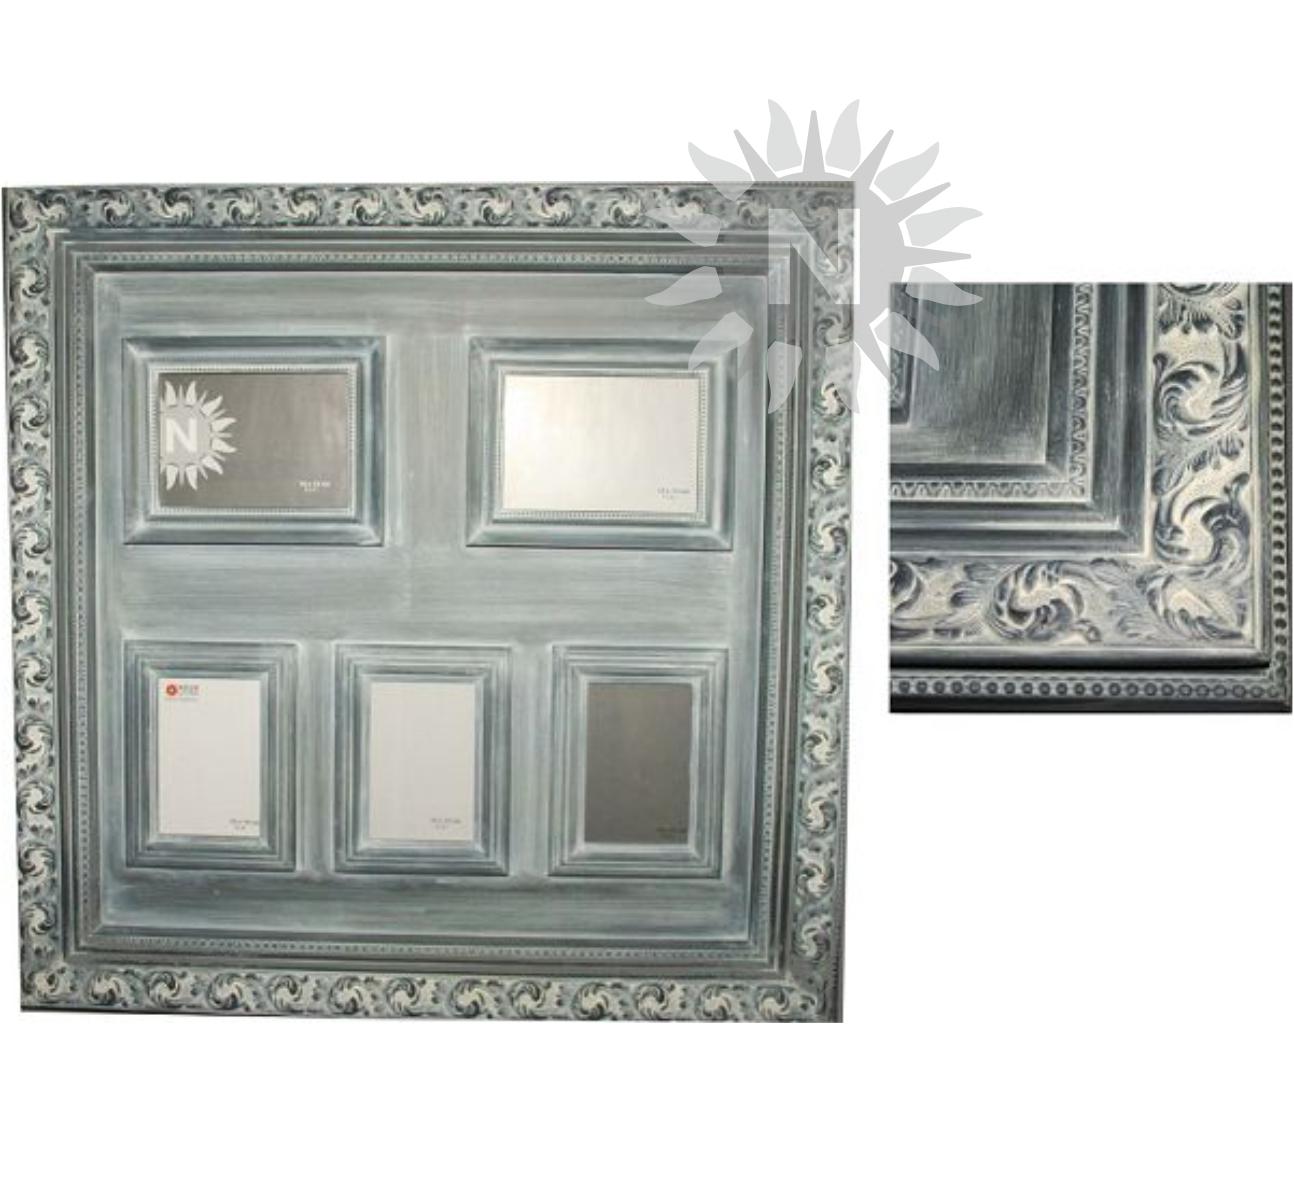 69040 – Bilderrahmen L, Barock-Design, für 5 Bilder (2x 13x18cm & 3x ...